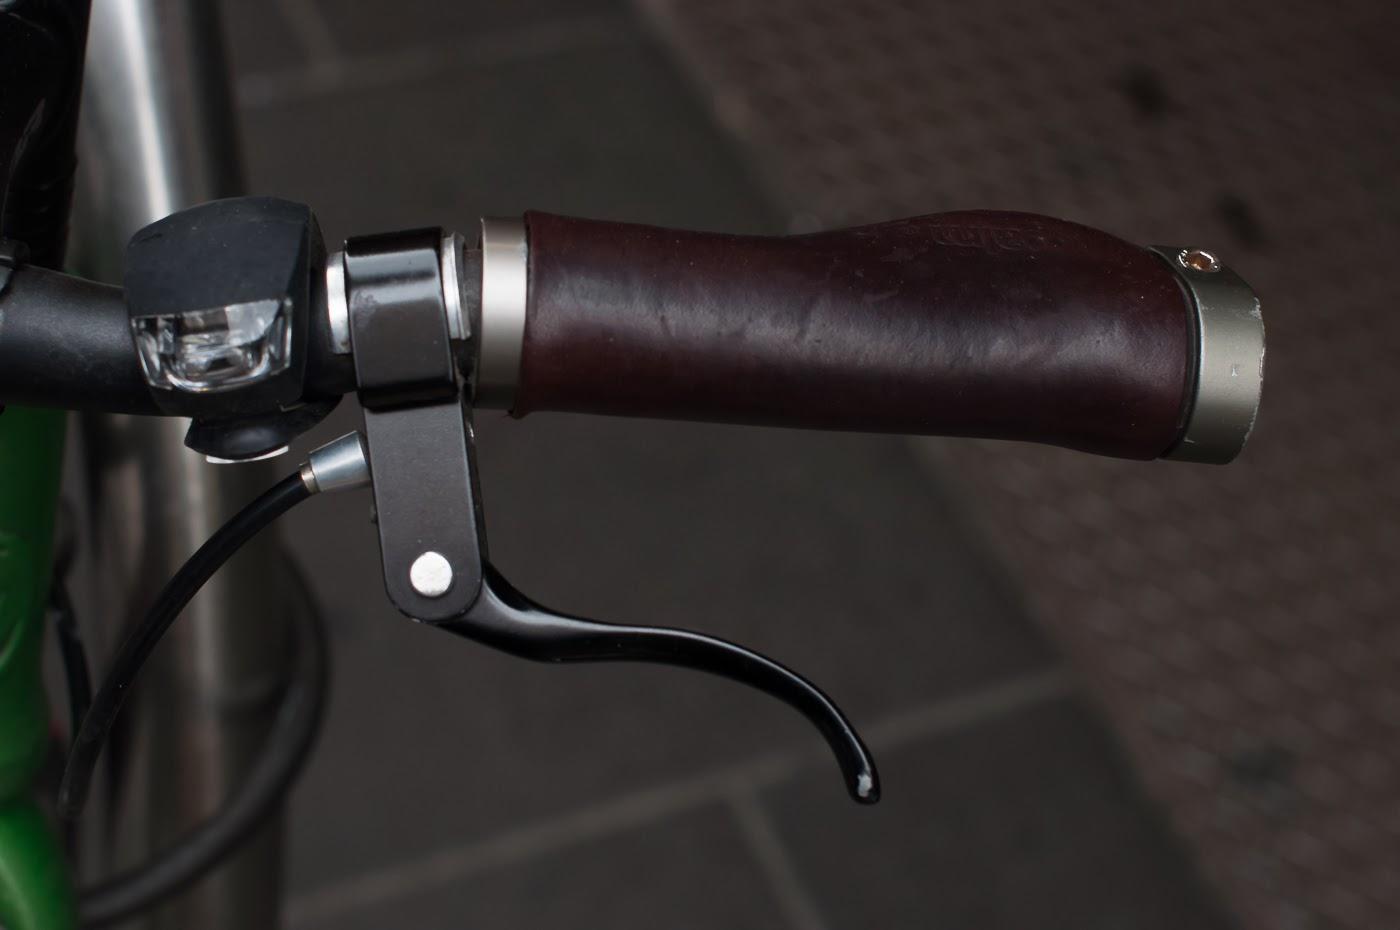 single speed, bike, bicycle, tim macauley, the biketorialist, melbourne, conversion, chain, tensioner road bik, mavic, propalm